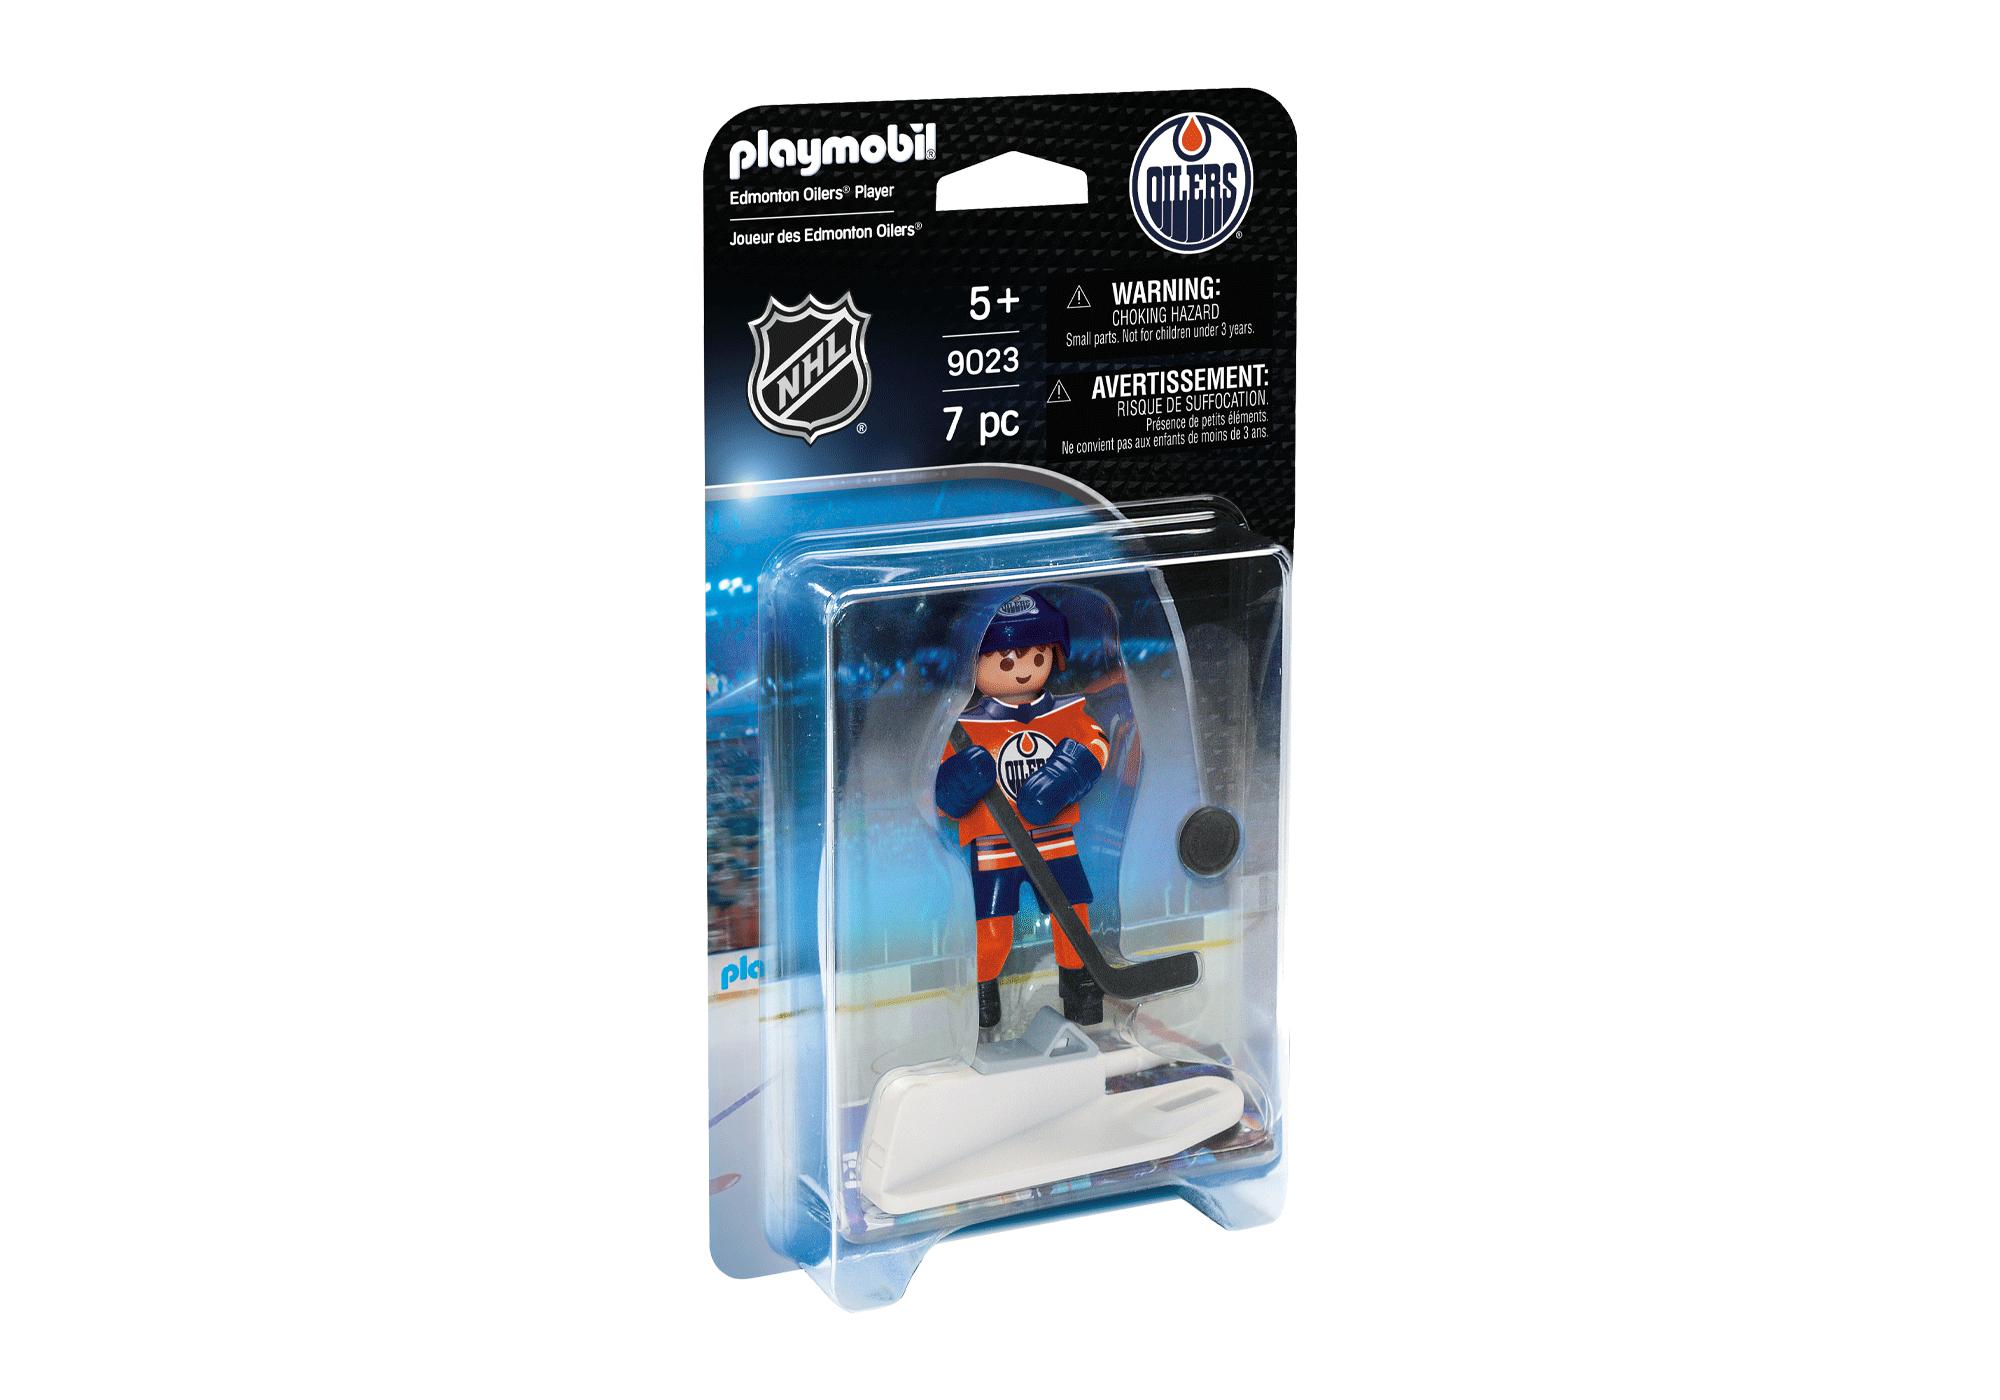 http://media.playmobil.com/i/playmobil/9023_product_box_front/NHL™ Edmonton Oilers™ Player